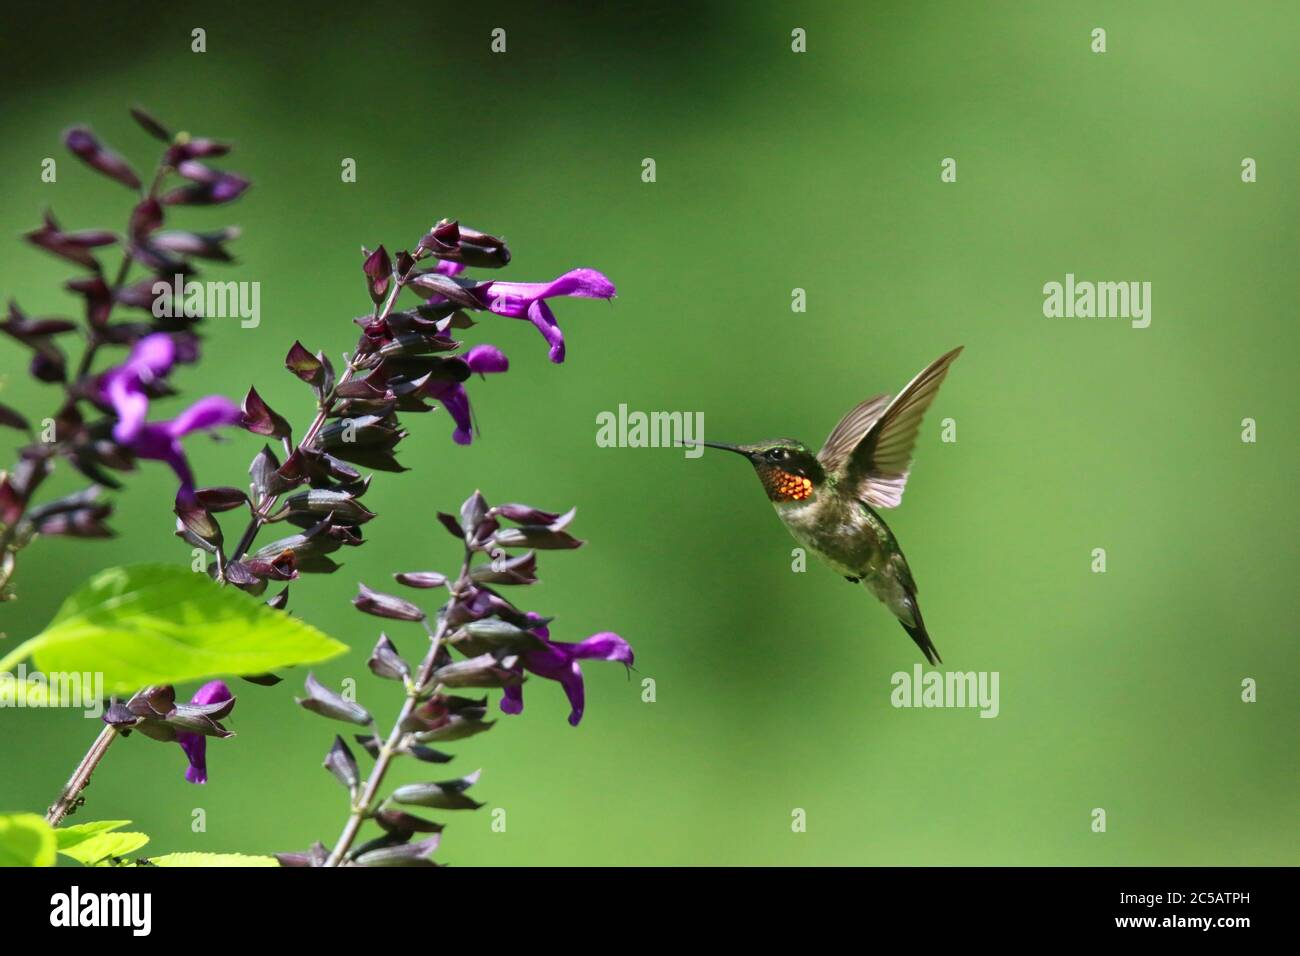 Male Ruby Throated Hummingbird Archilochus colubris Feeding on Purple Salvia Flowers Stock Photo